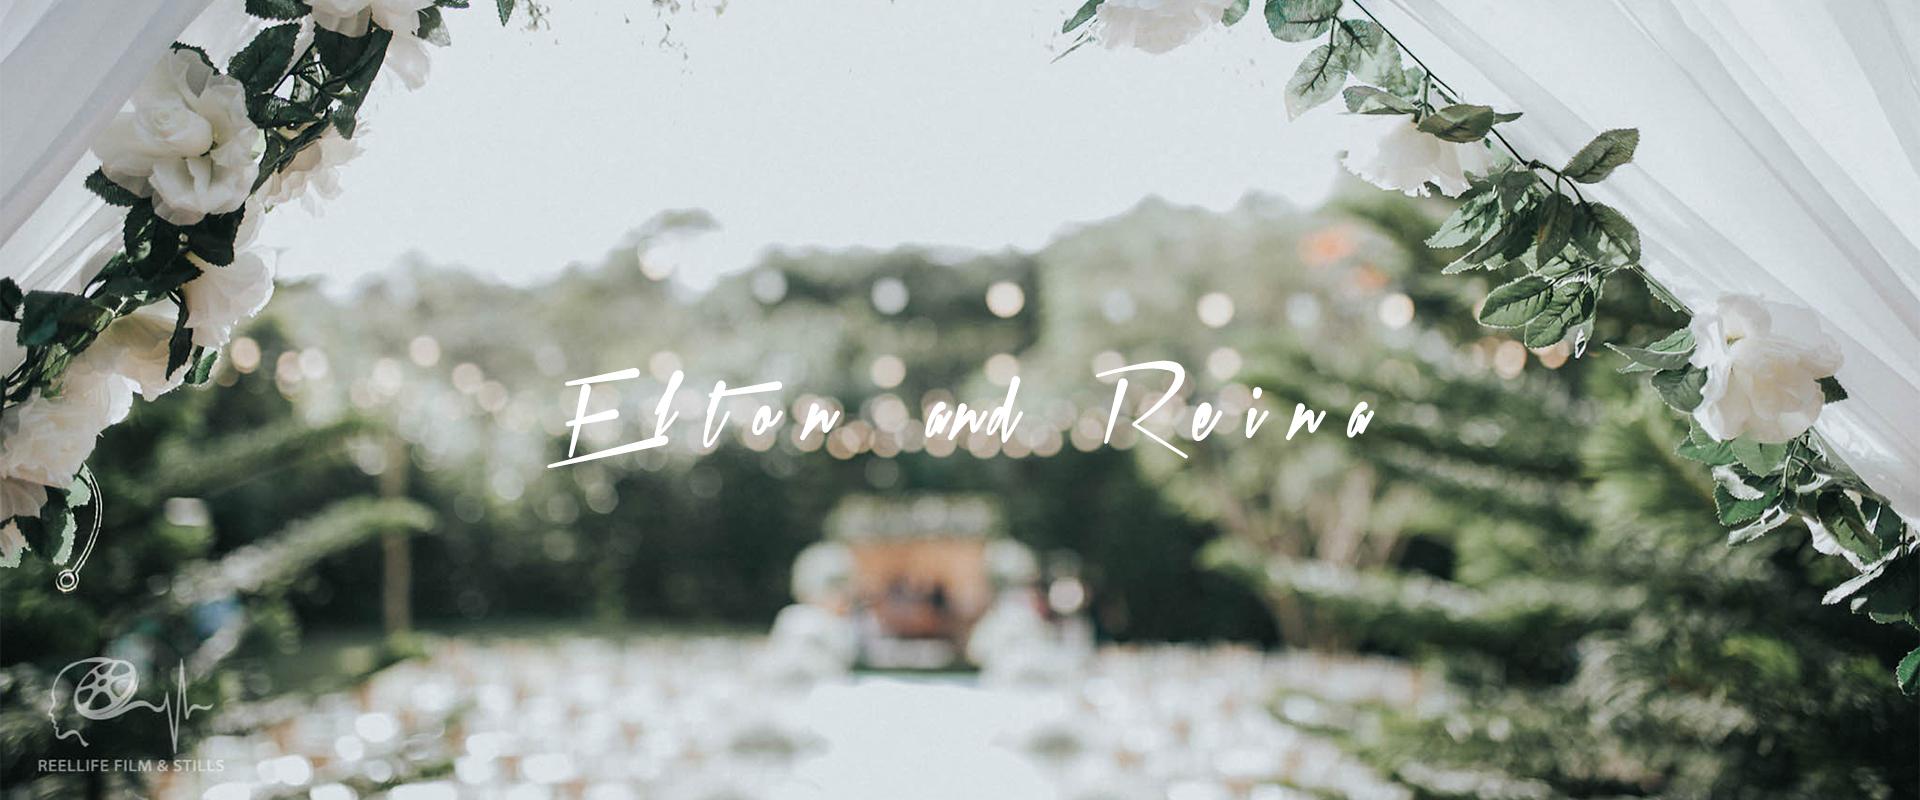 Elton + Reina | Tagaytay, Philippines | the farmhills garden